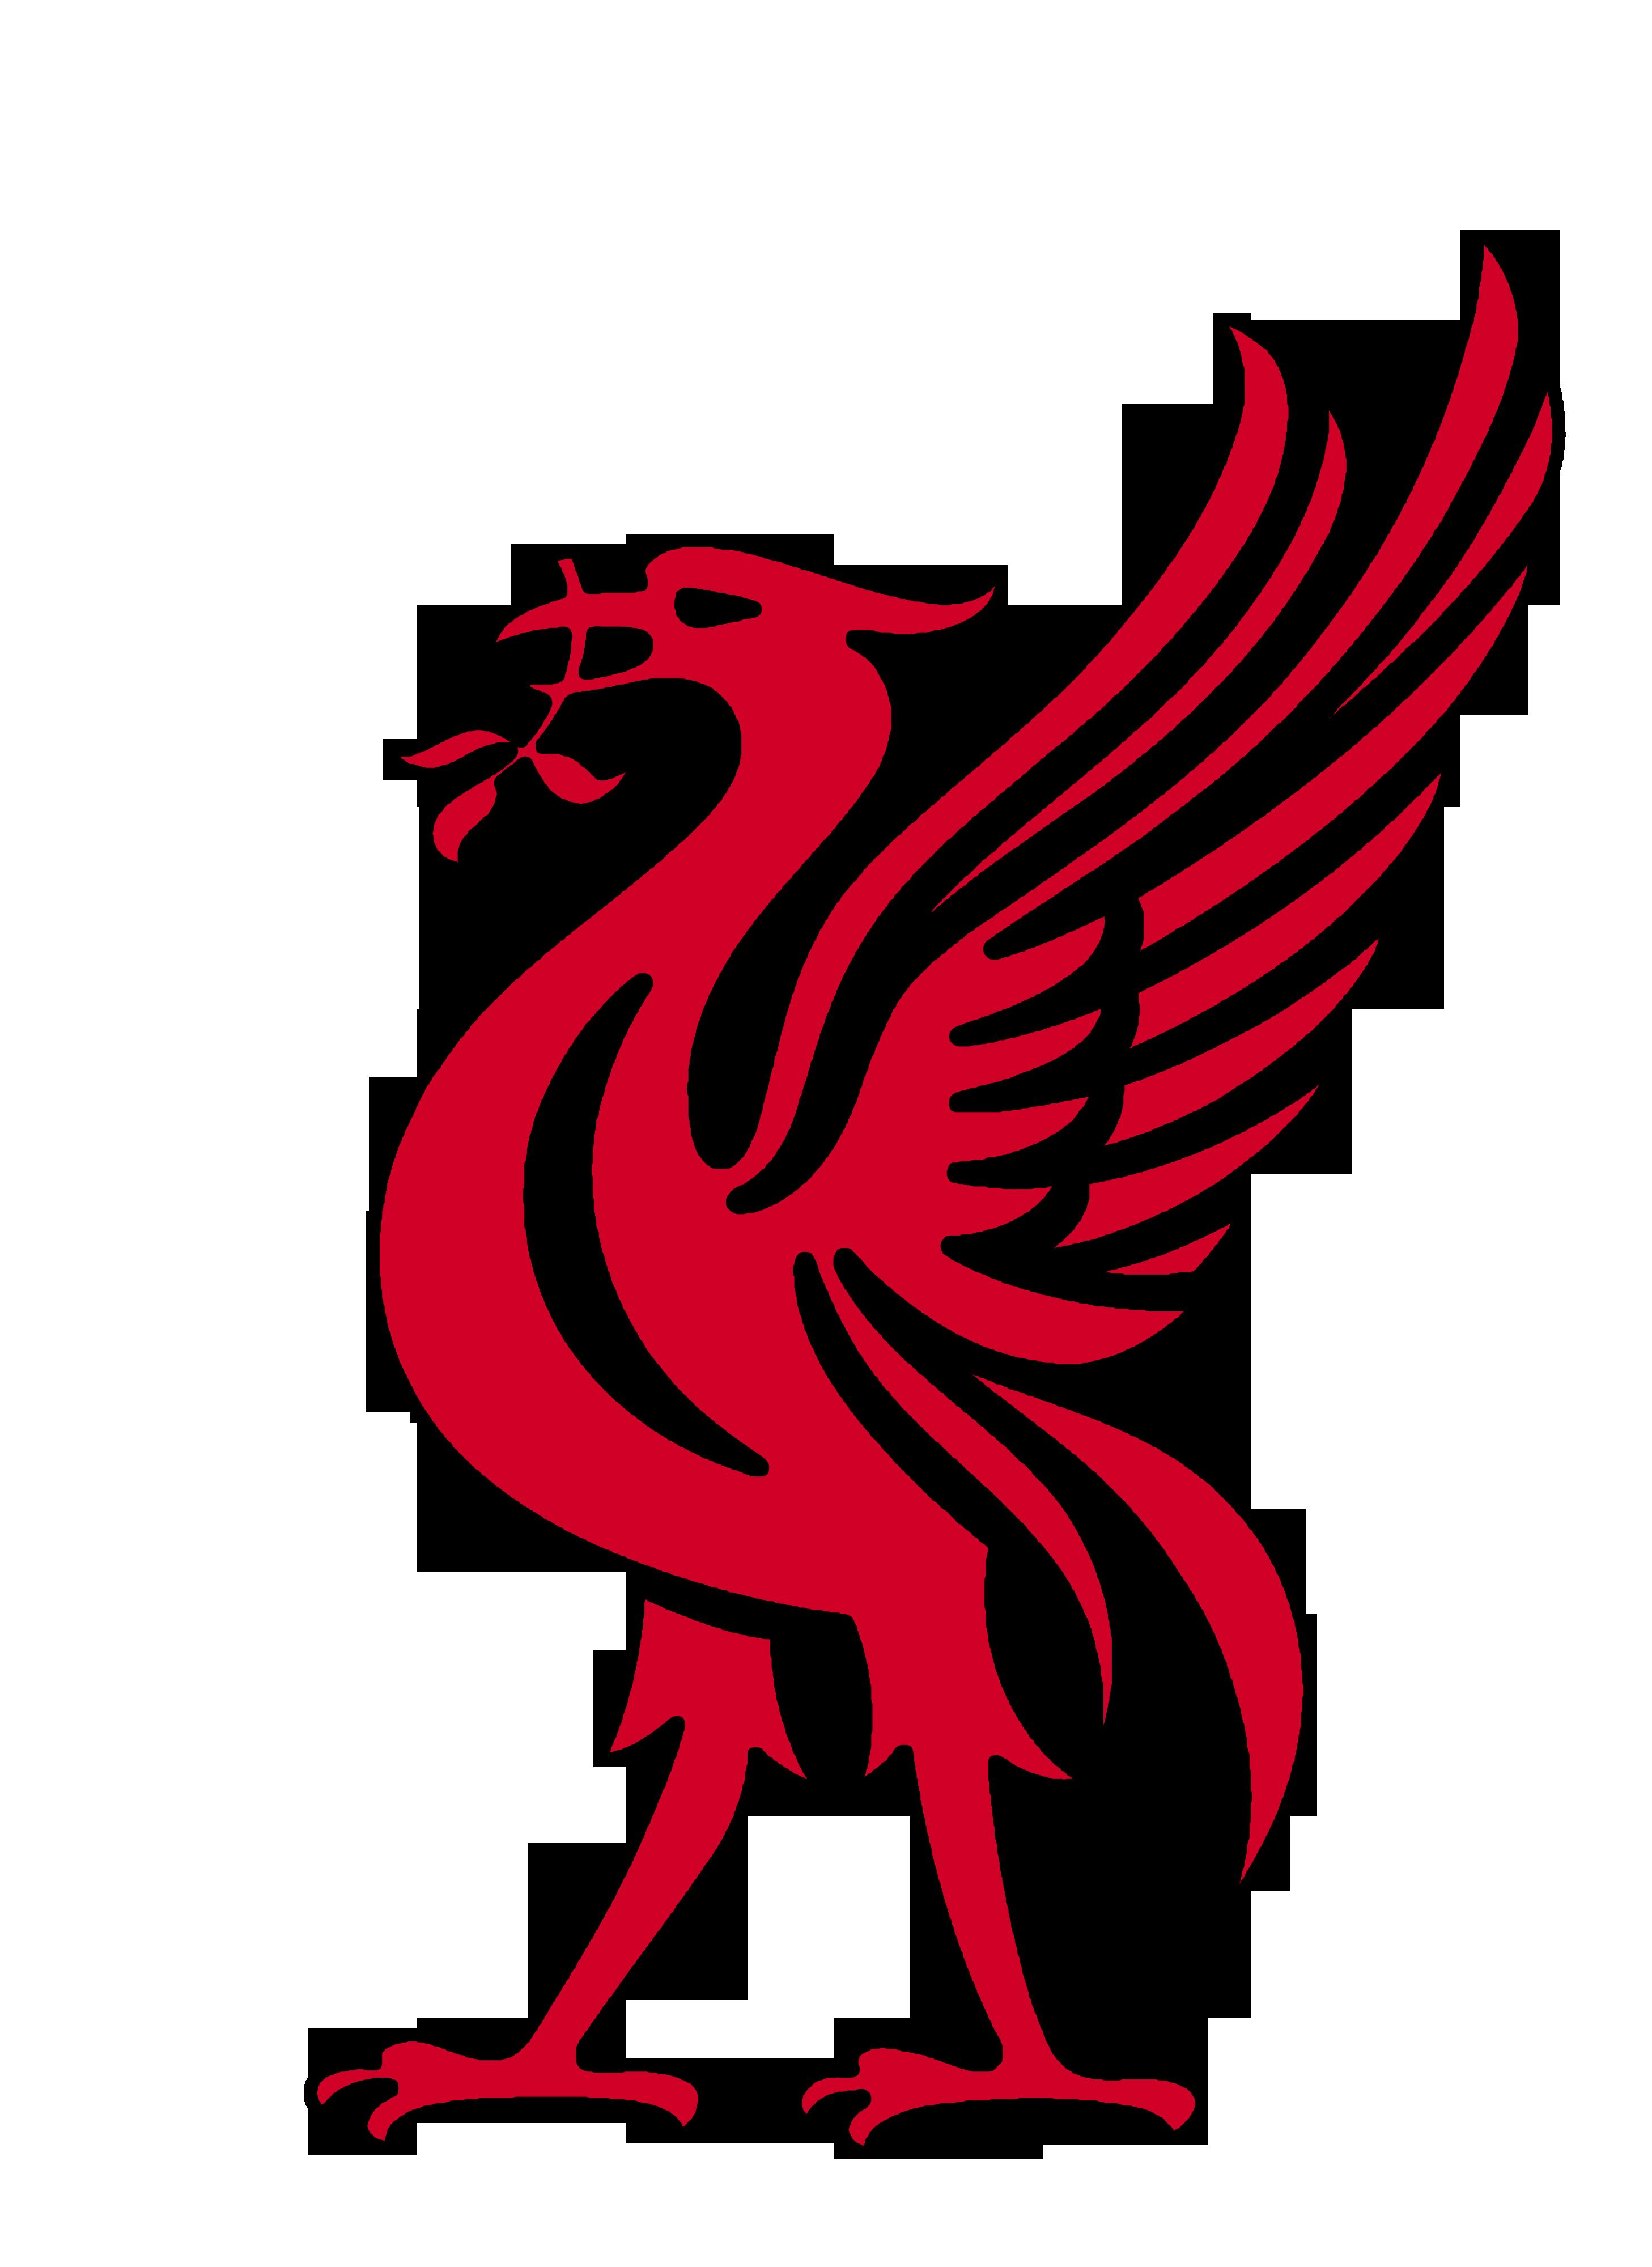 you ll never walk alone lfc liverpool logo liverpool tattoo red bird tattoos pinterest